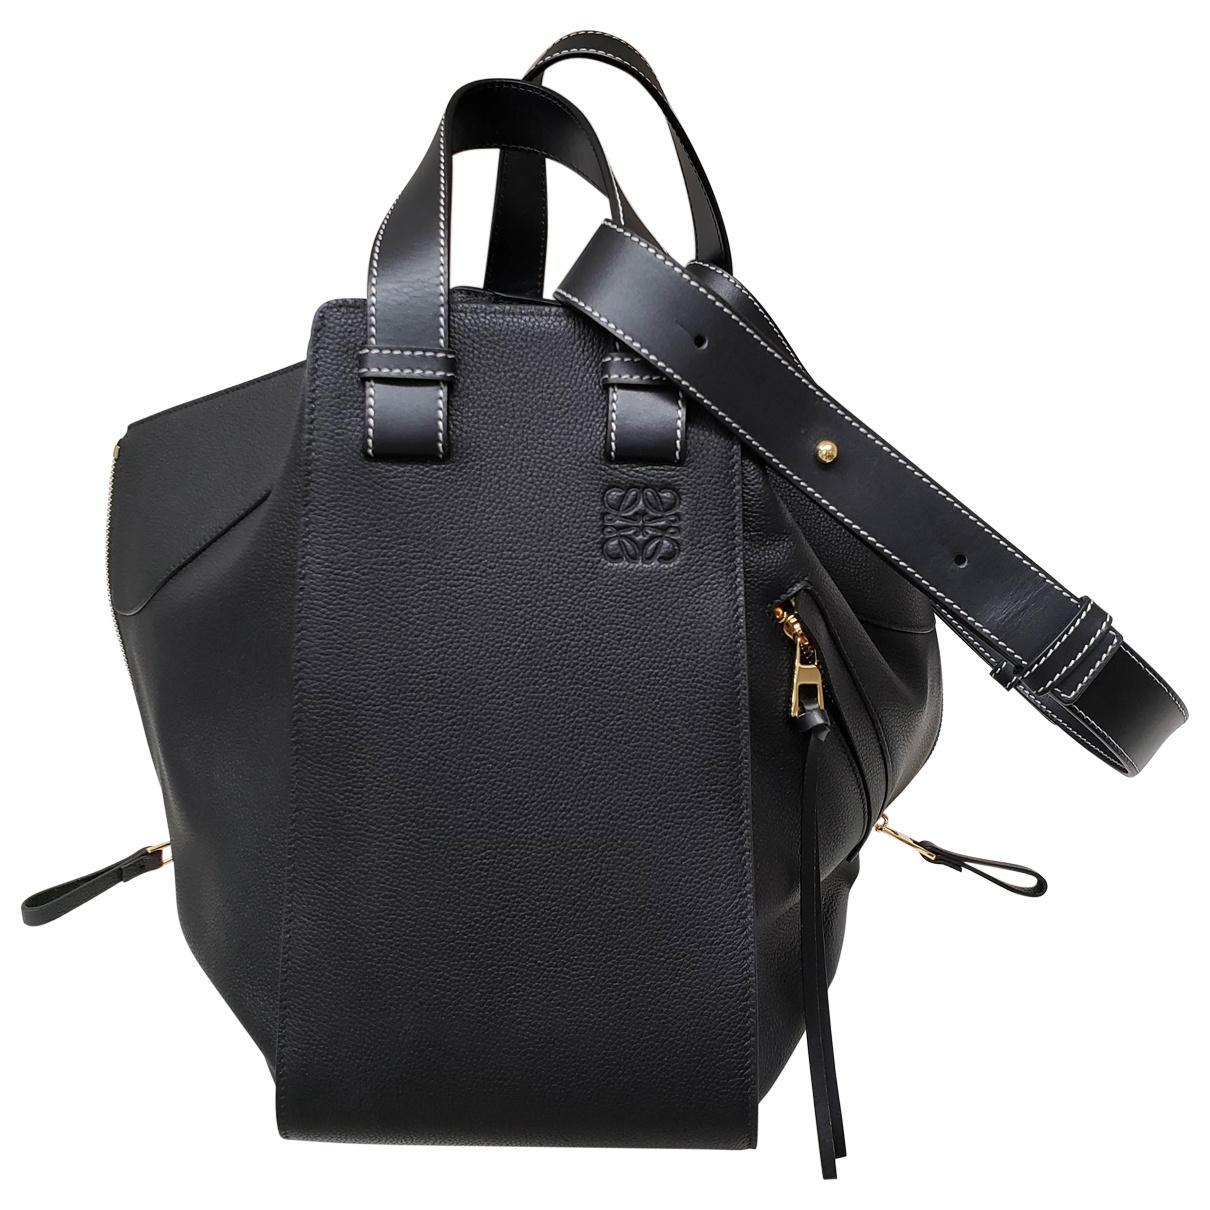 e7a01bef3b37 Loewe Hammock Leather Handbag in Black - Lyst